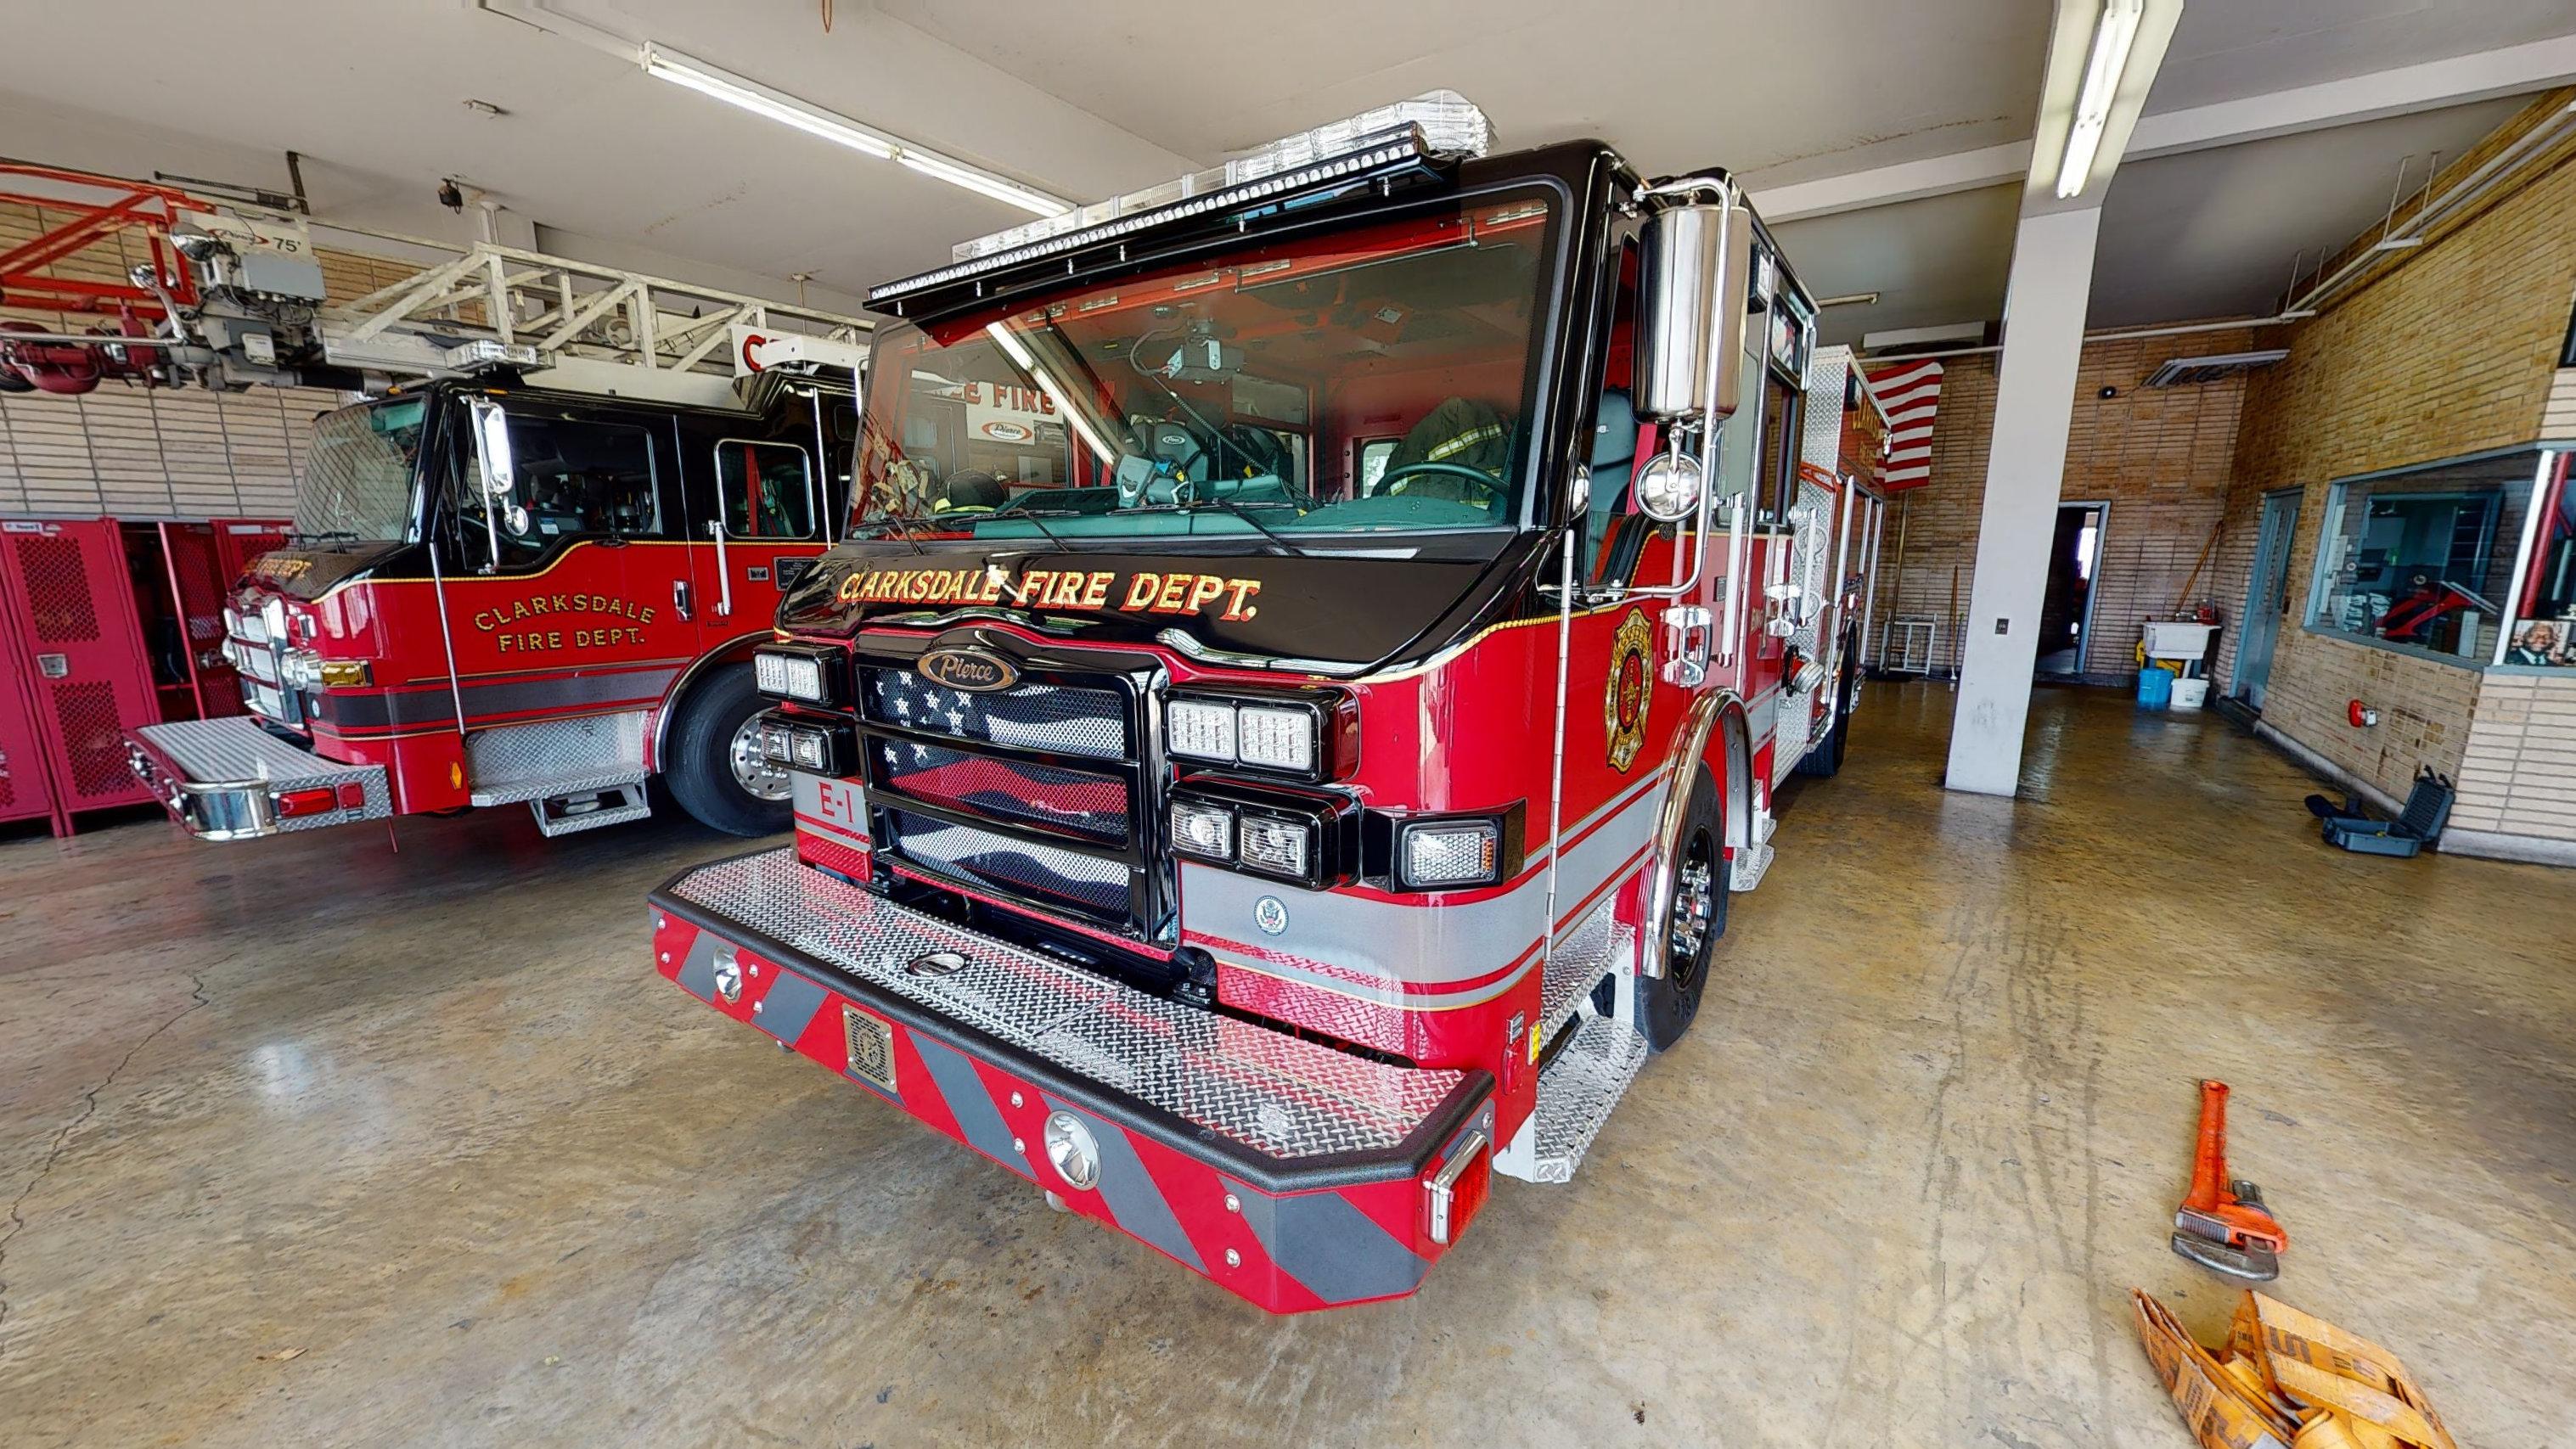 7_Clarksdale-Fire-Dept-06072021_112119